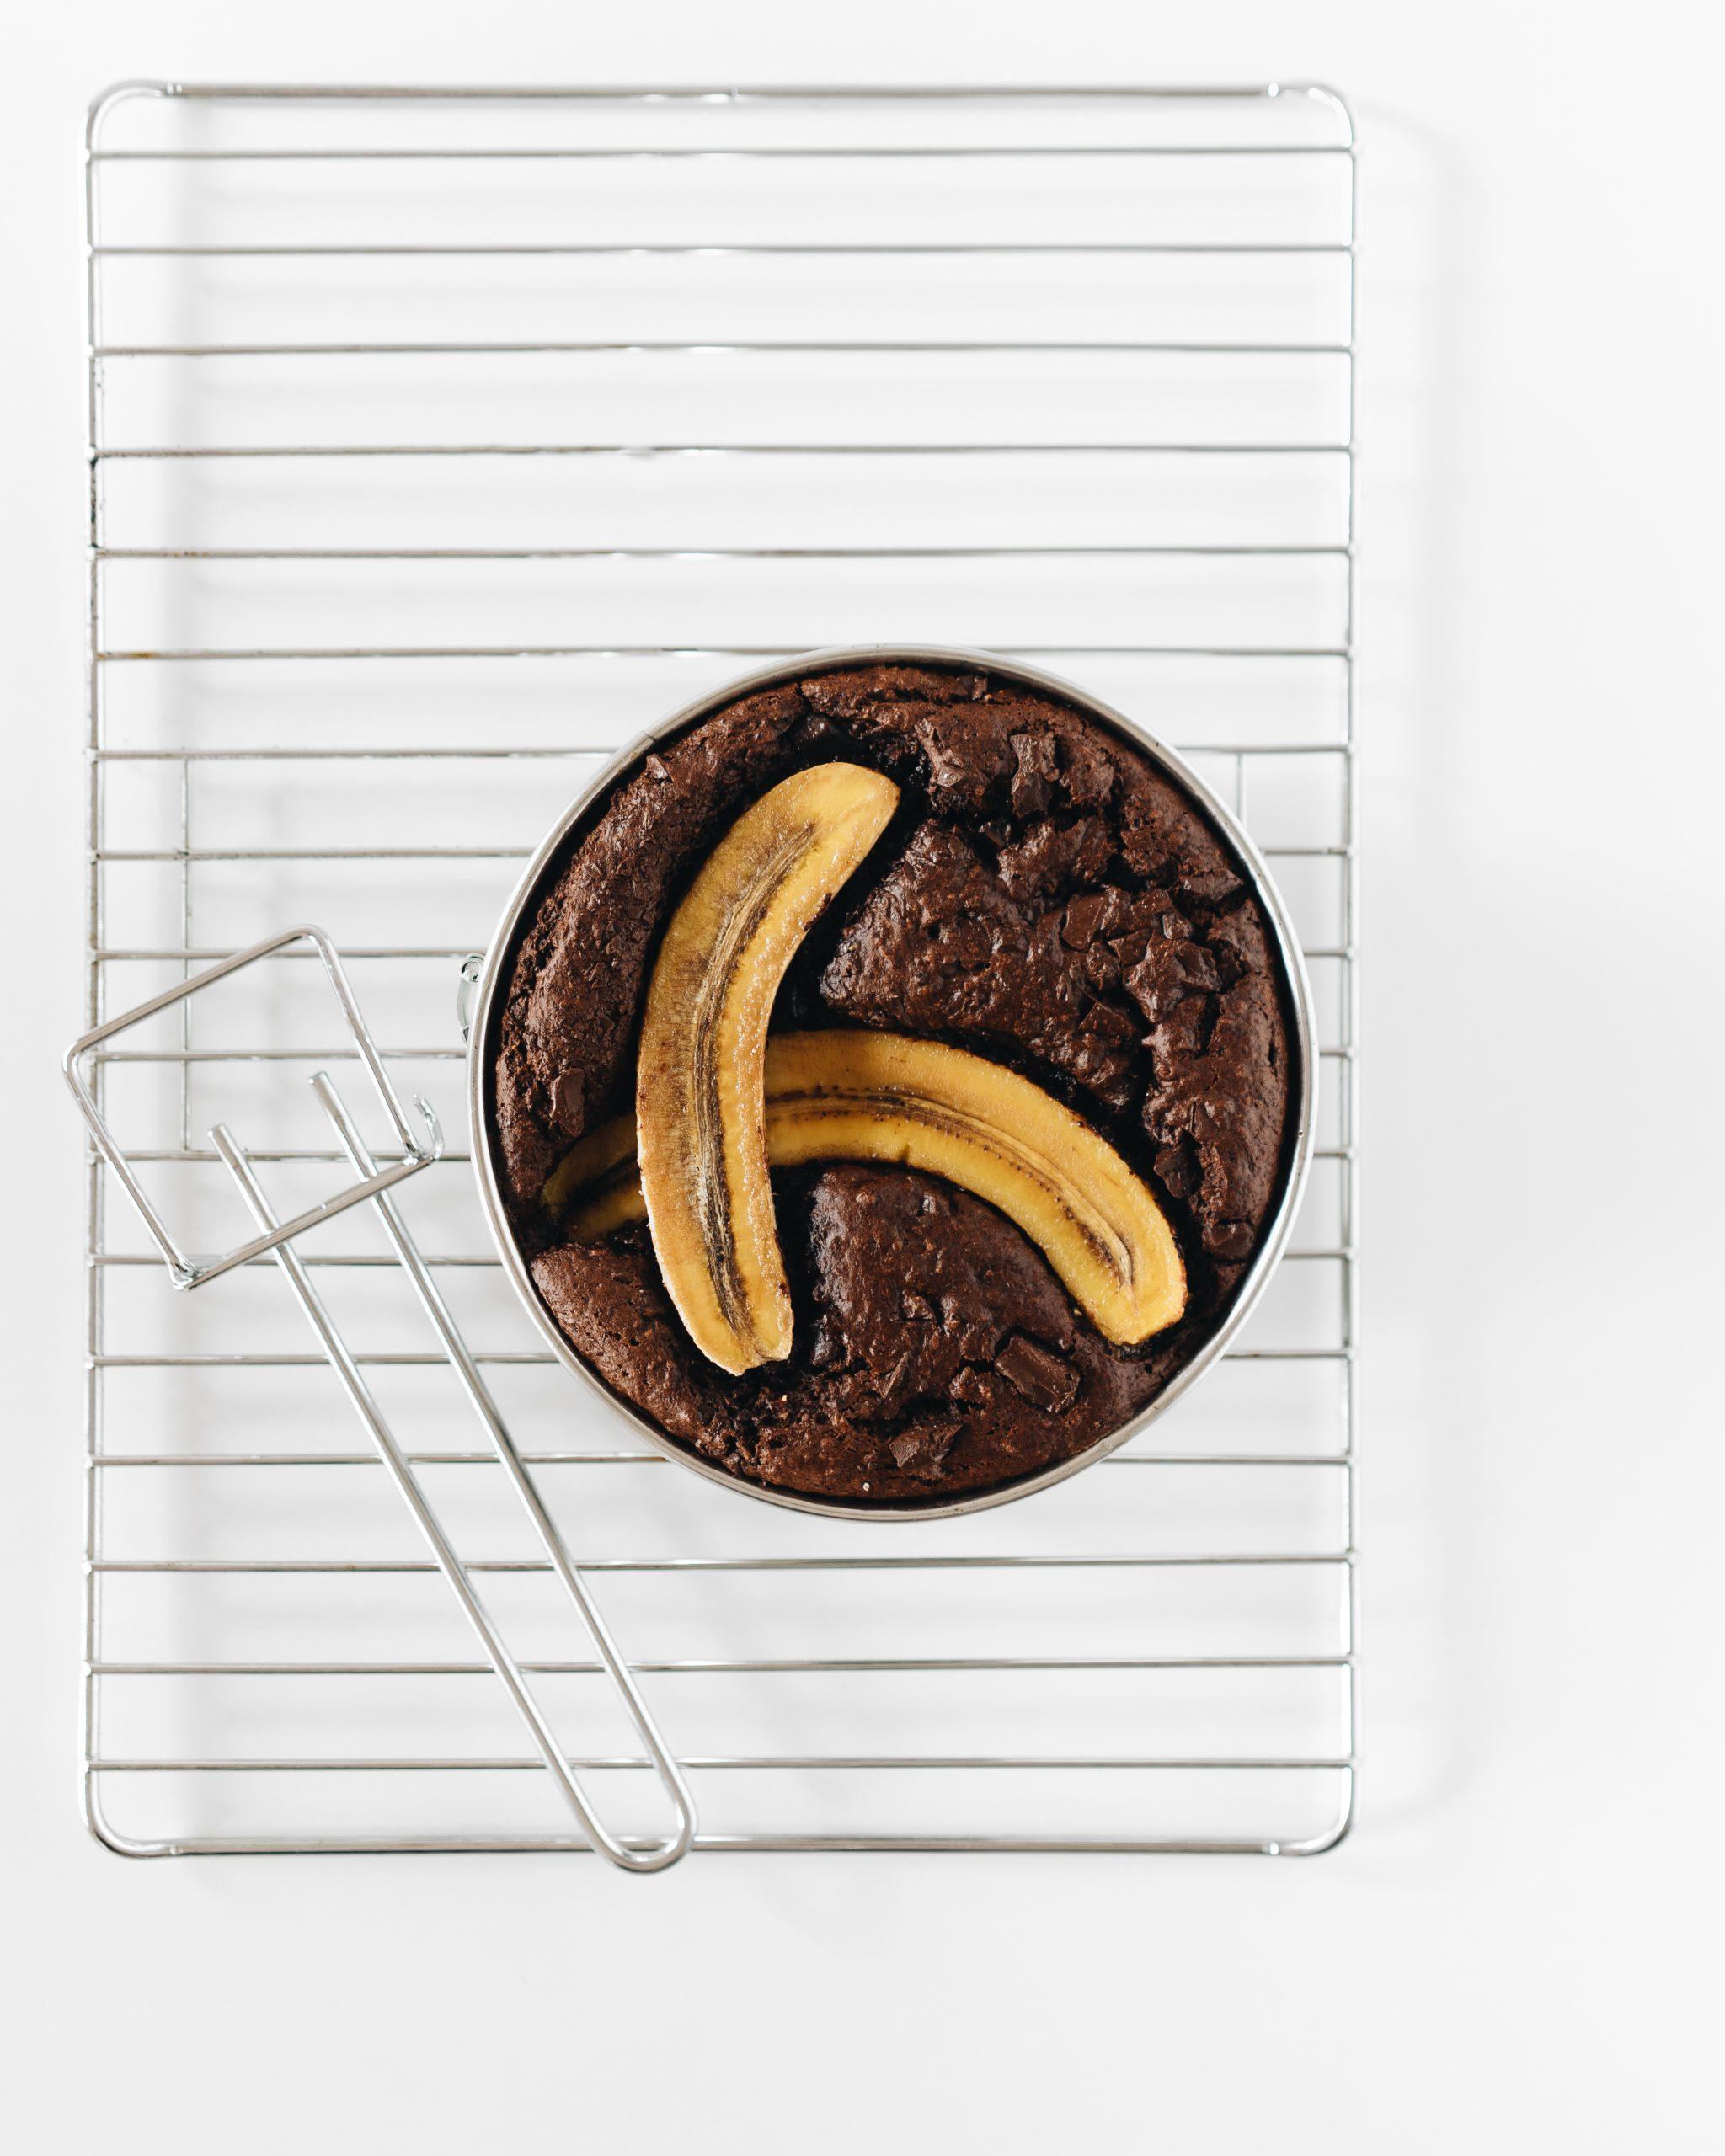 Banana bread vegano con chocolate